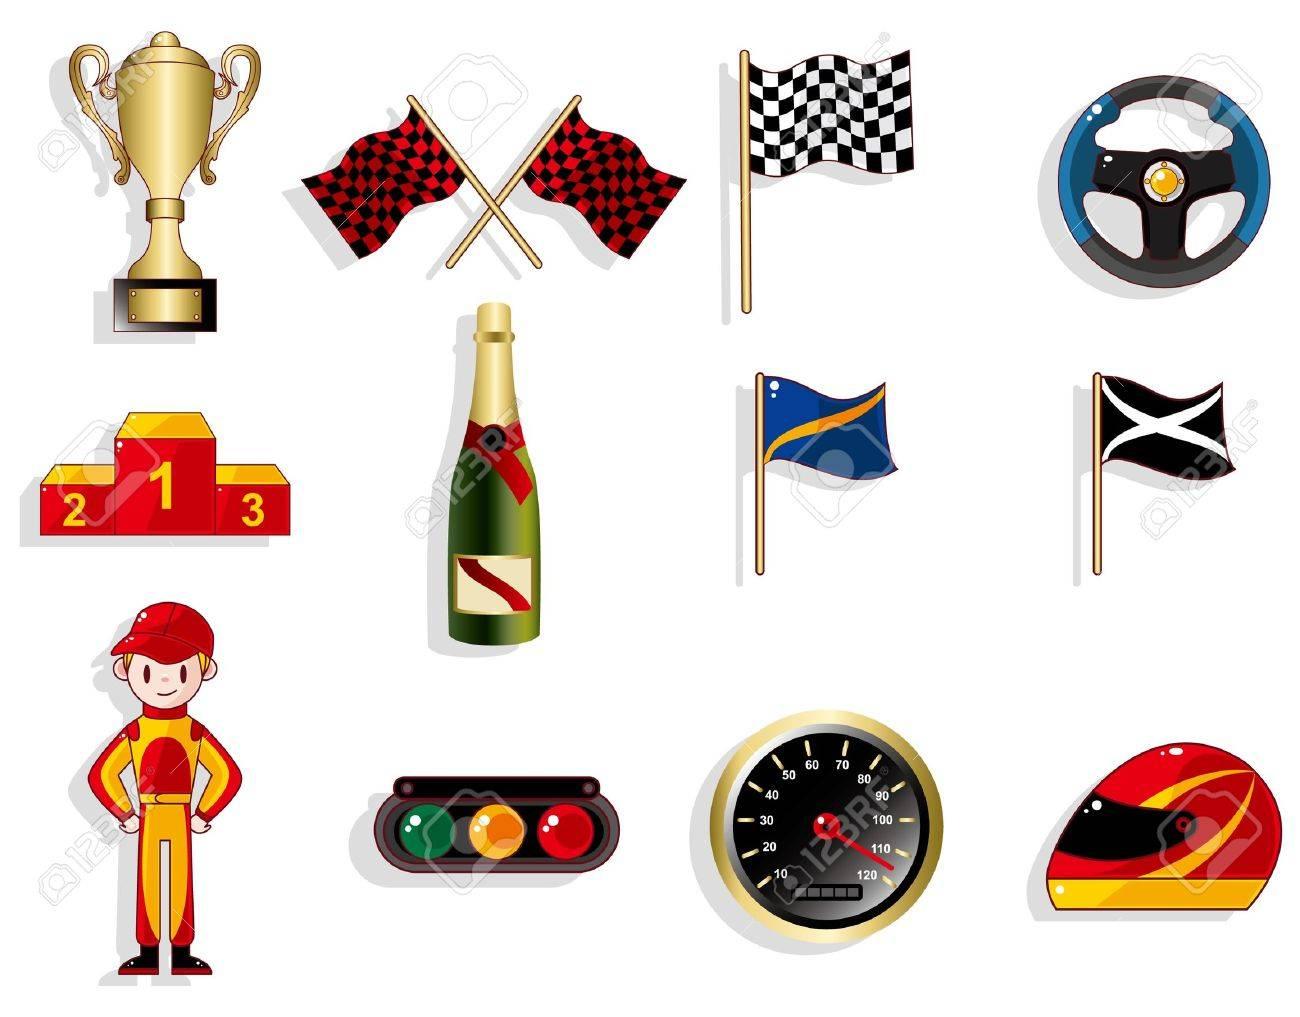 Cartoon F1 Car Racing Icon Set Royalty Free Cliparts Vectors And Stock Illustration Image 9598648